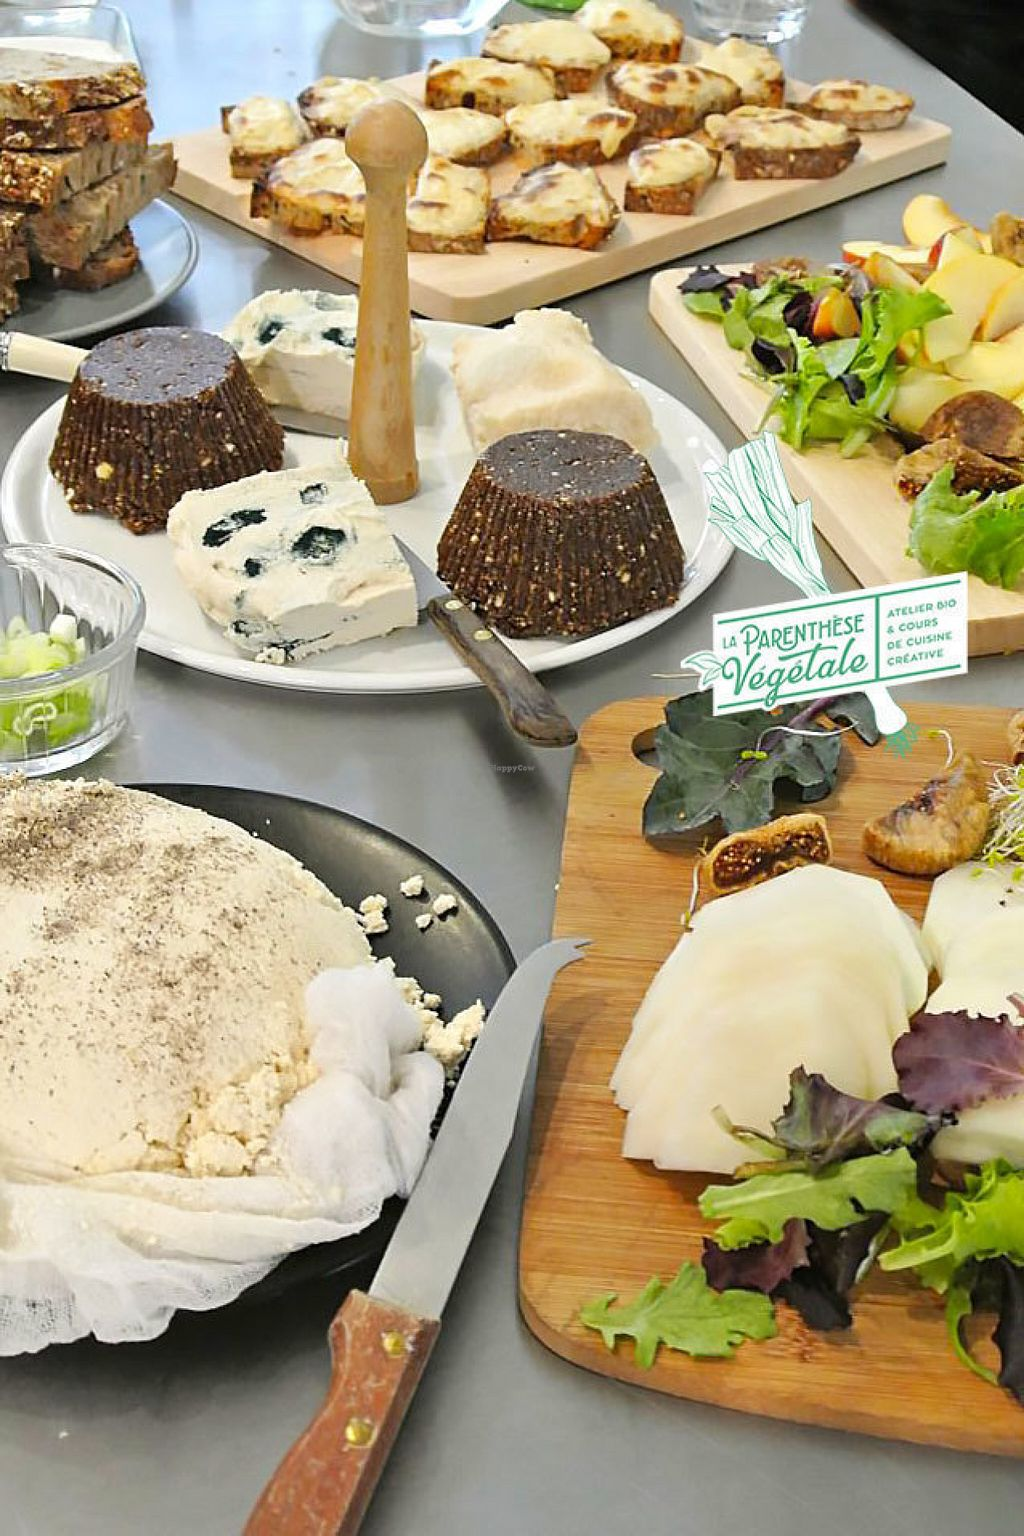 "Photo of La Parenthese Vegetale  by <a href=""/members/profile/MellePigut"">MellePigut</a> <br/>Delicious vegan homemade cheese <br/> July 11, 2016  - <a href='/contact/abuse/image/76373/159149'>Report</a>"